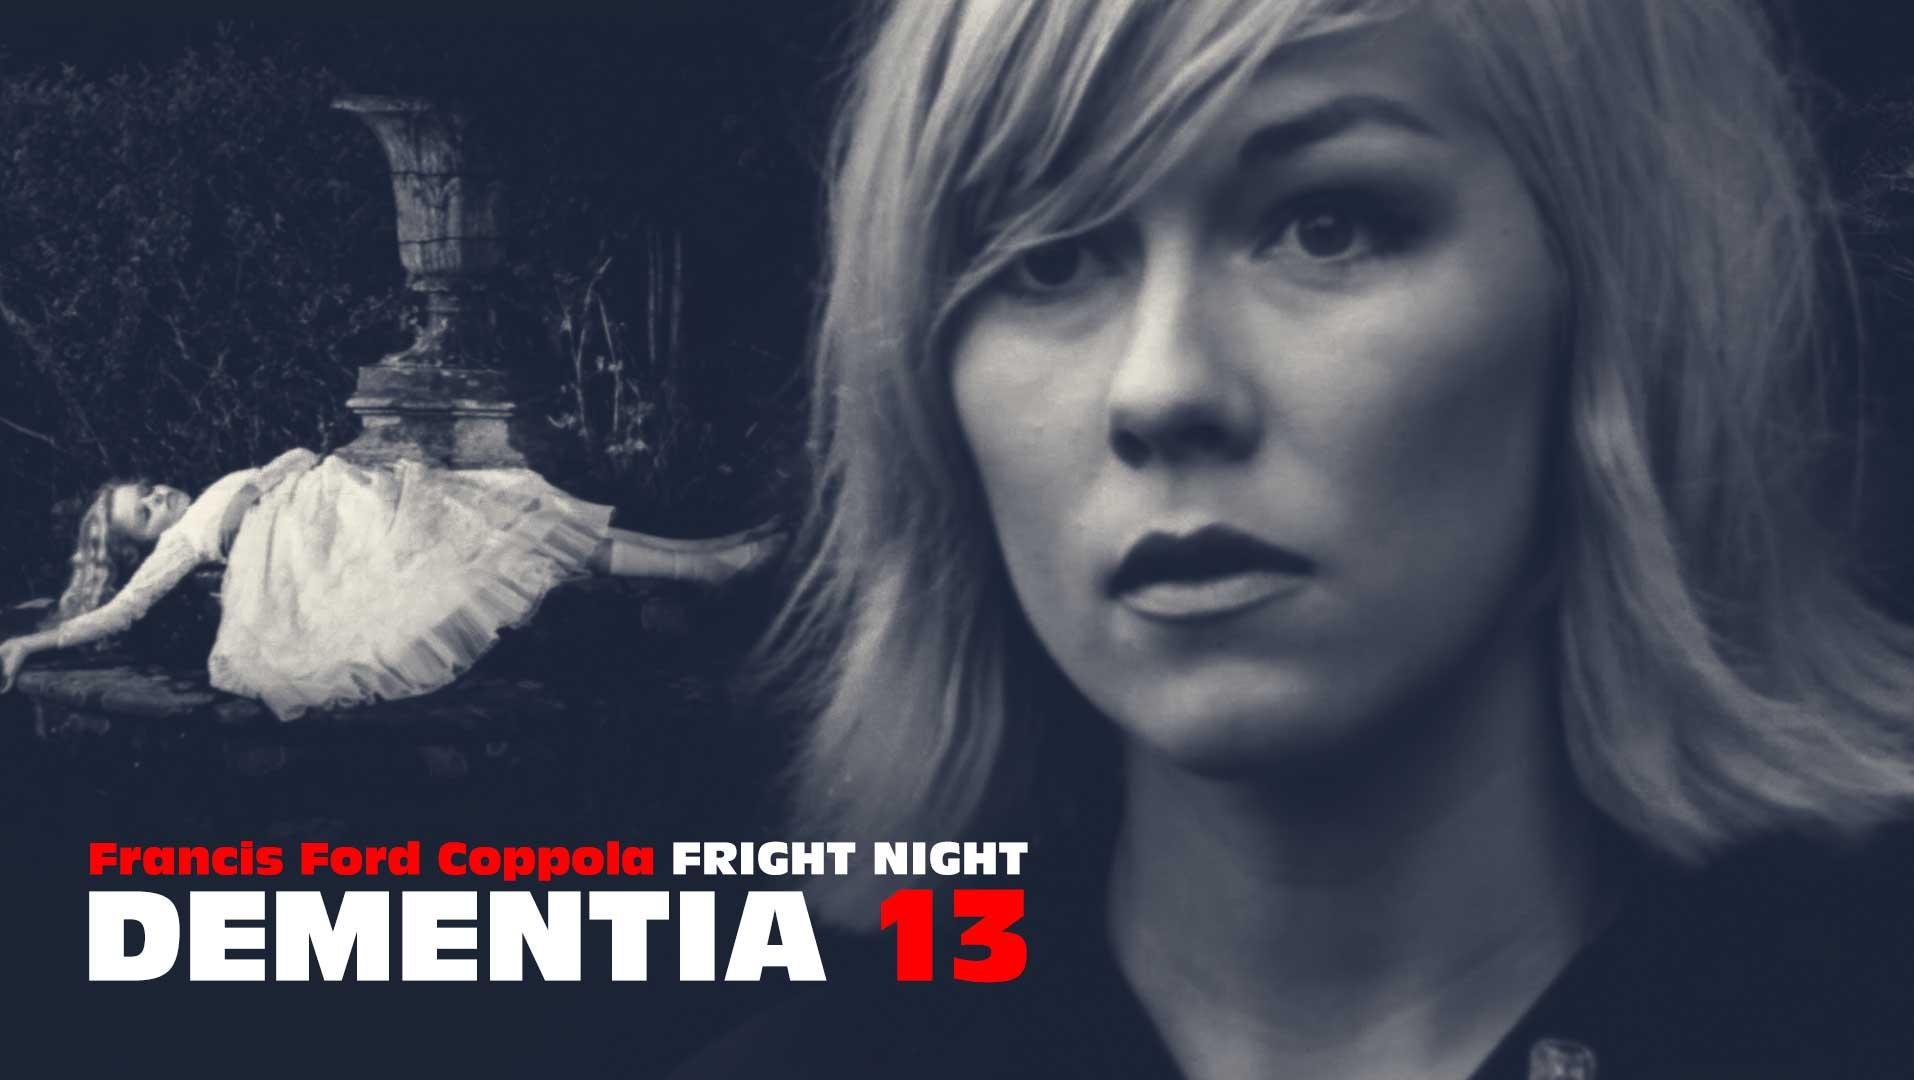 fright-night-dementia-13\header.jpg